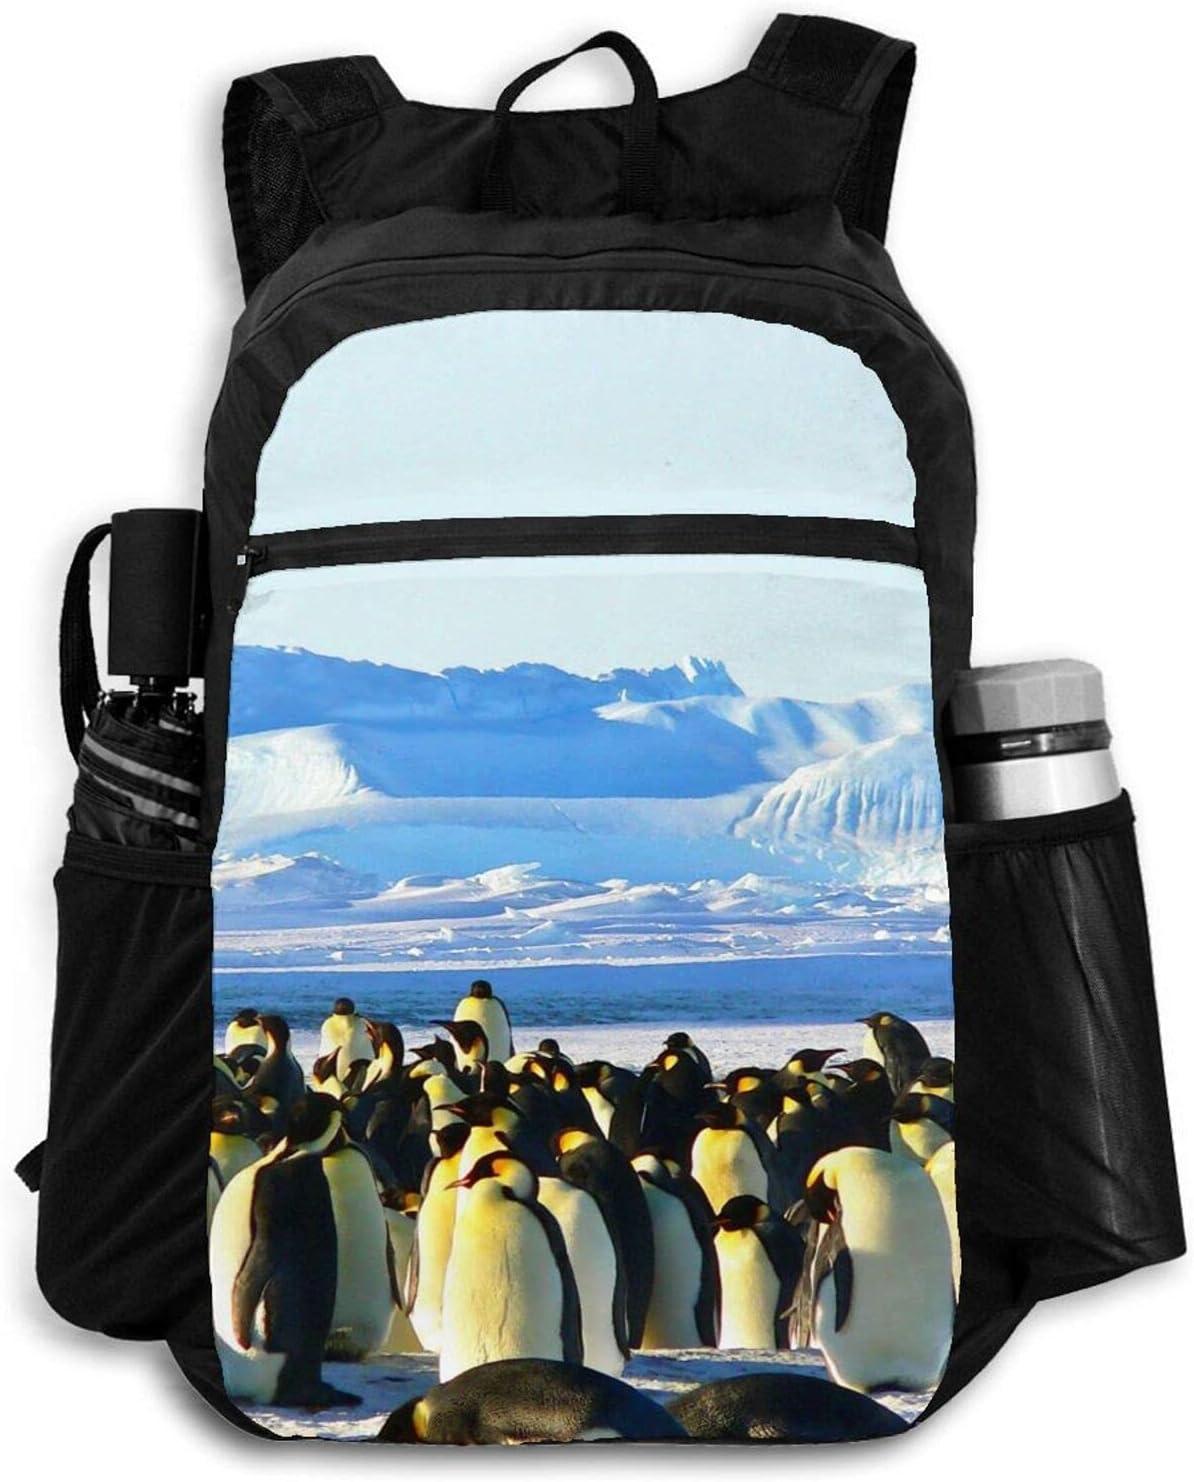 Zolama Penguins Backpacks for Washington Mall Women Men Packable Max 90% OFF Li Daypack Cute